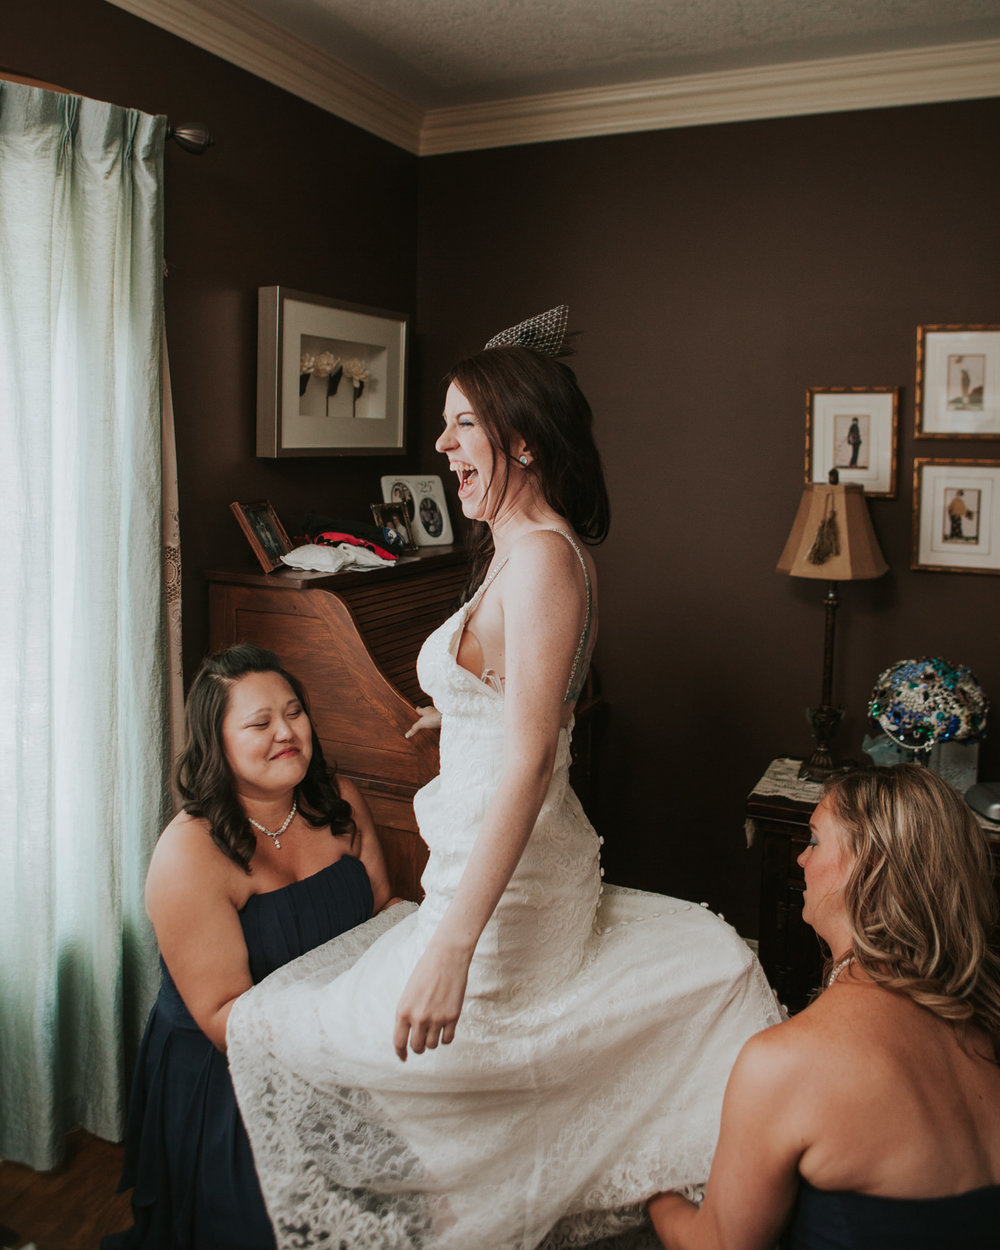 Vancouver wedding photographer - Pam 5